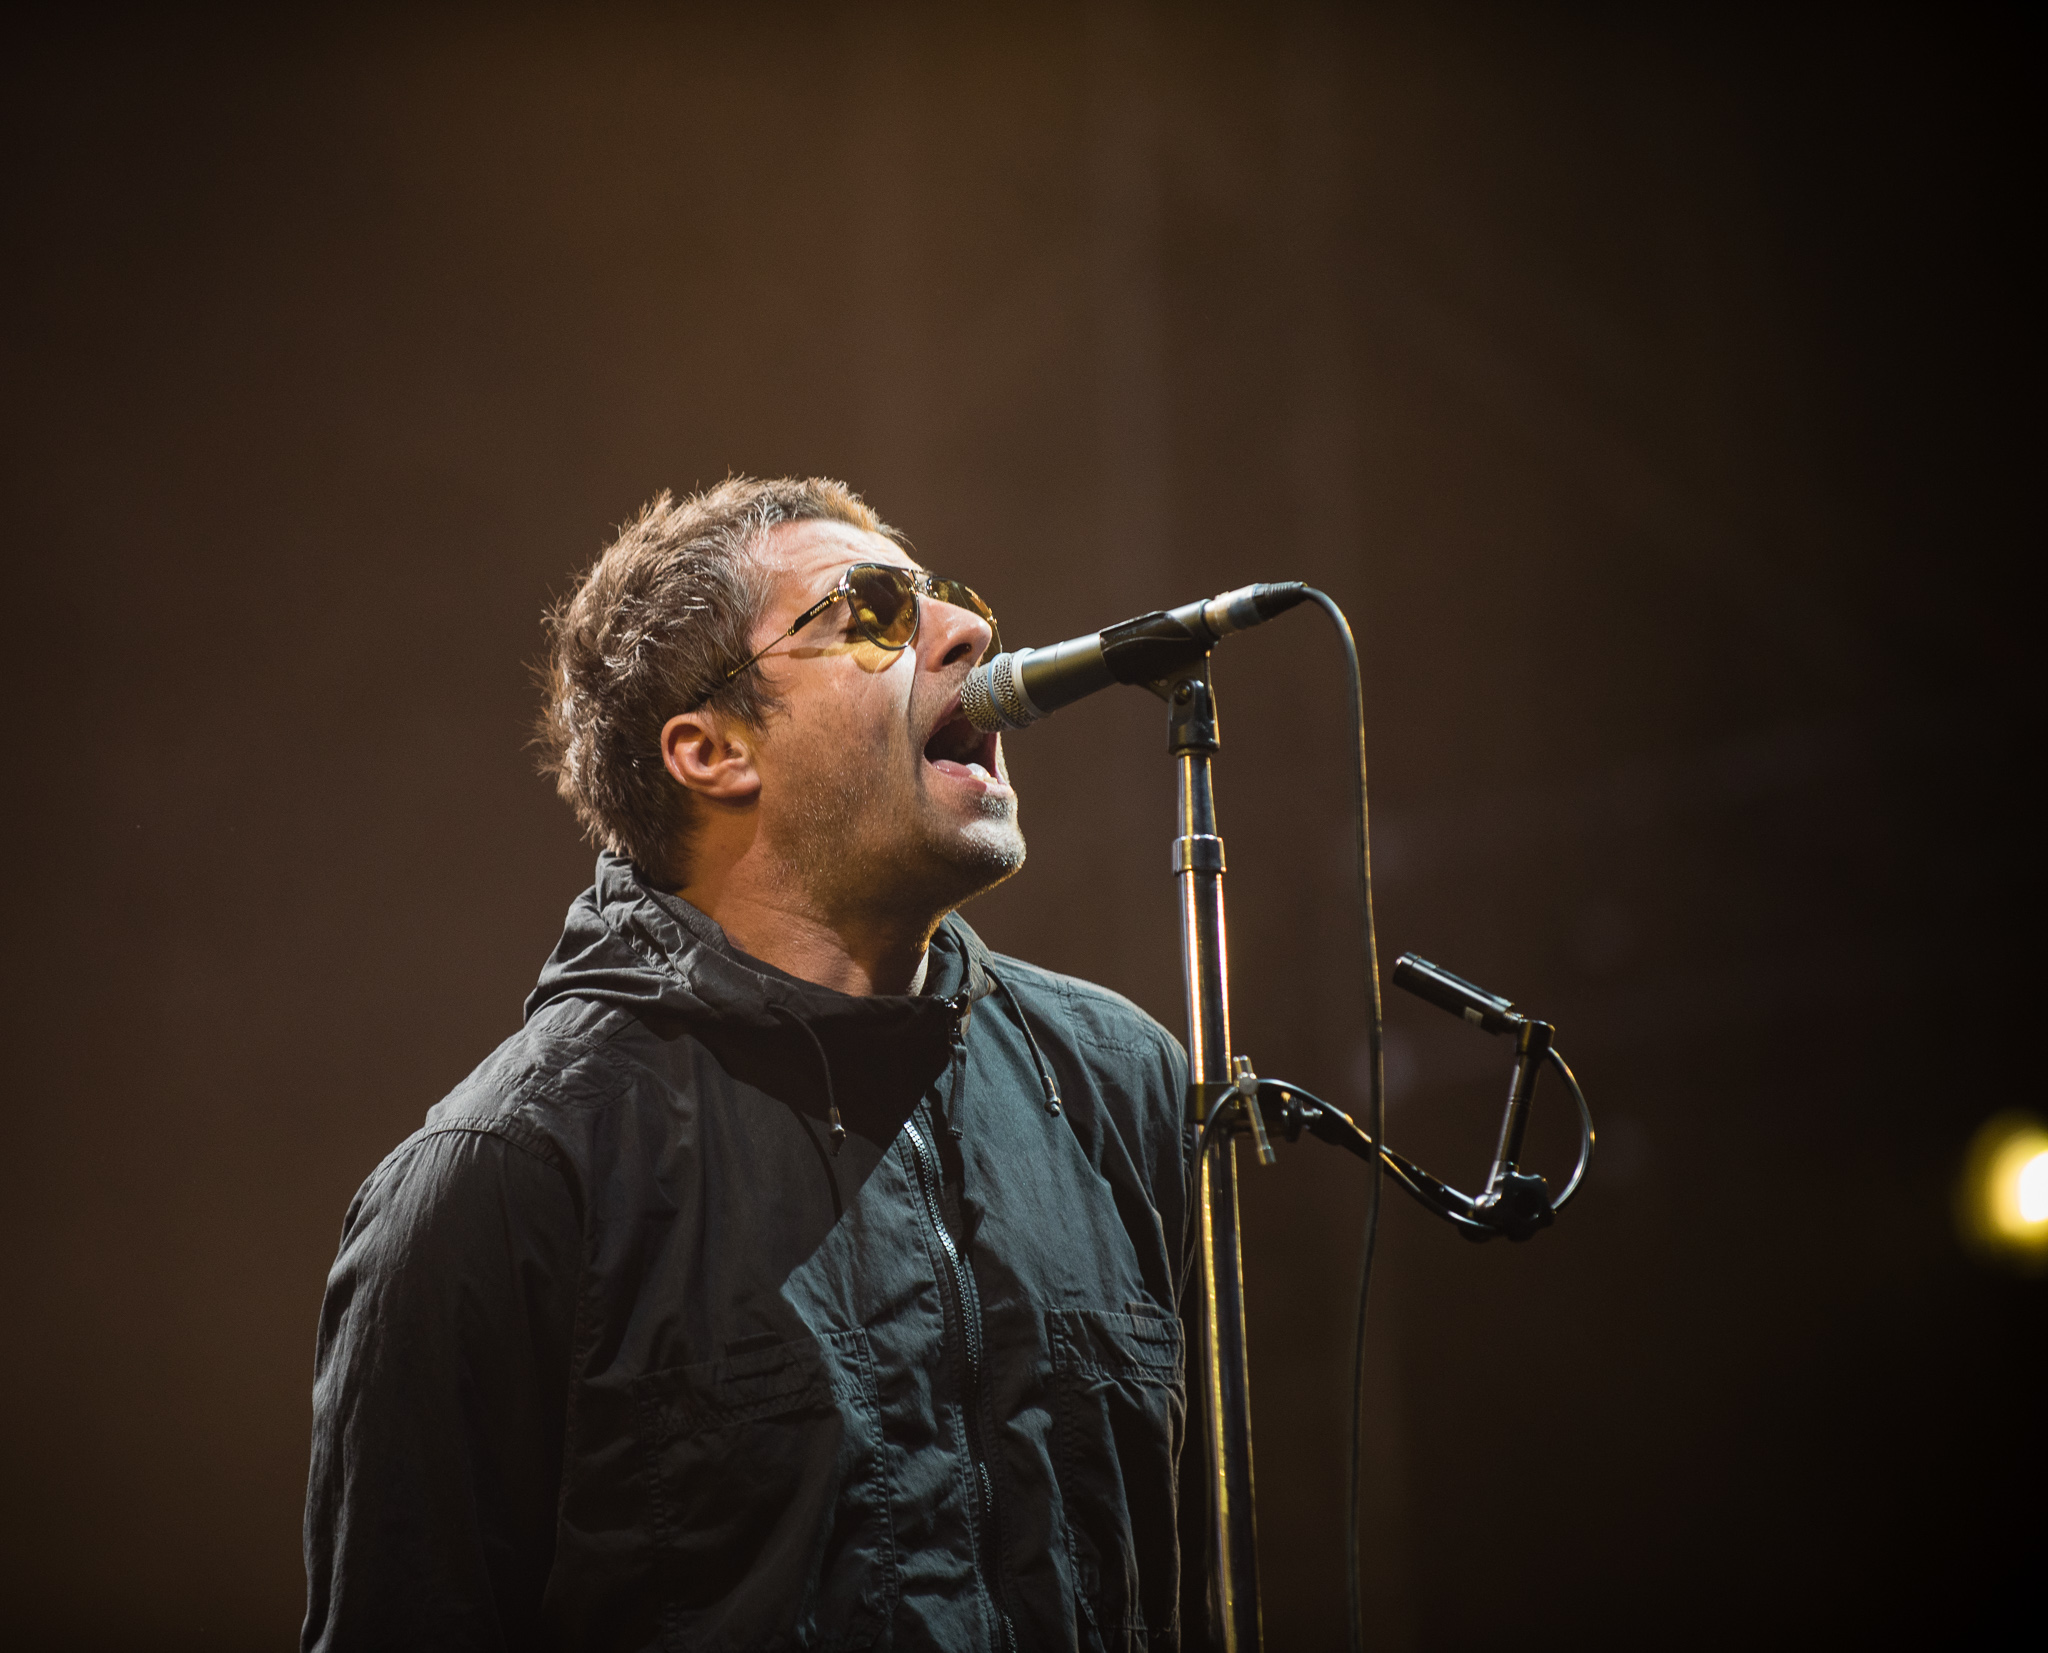 Liam Gallagher – Twisted Soul – Bugzy Malone – Richard Ashcroft // Manchester, UK 8.18.18